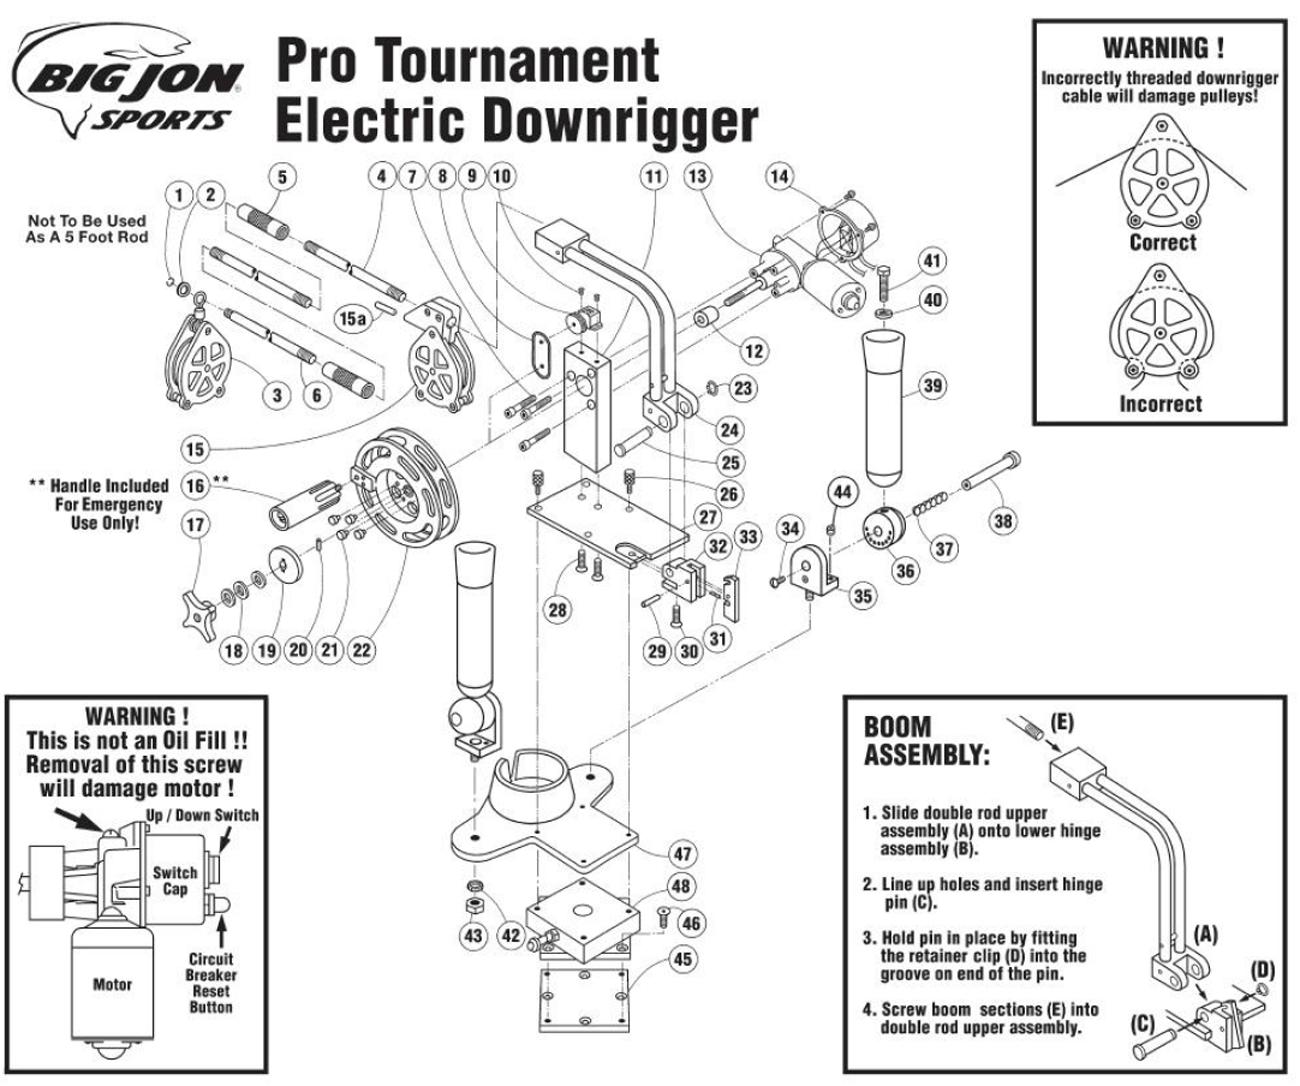 Big Jon Replacement Parts